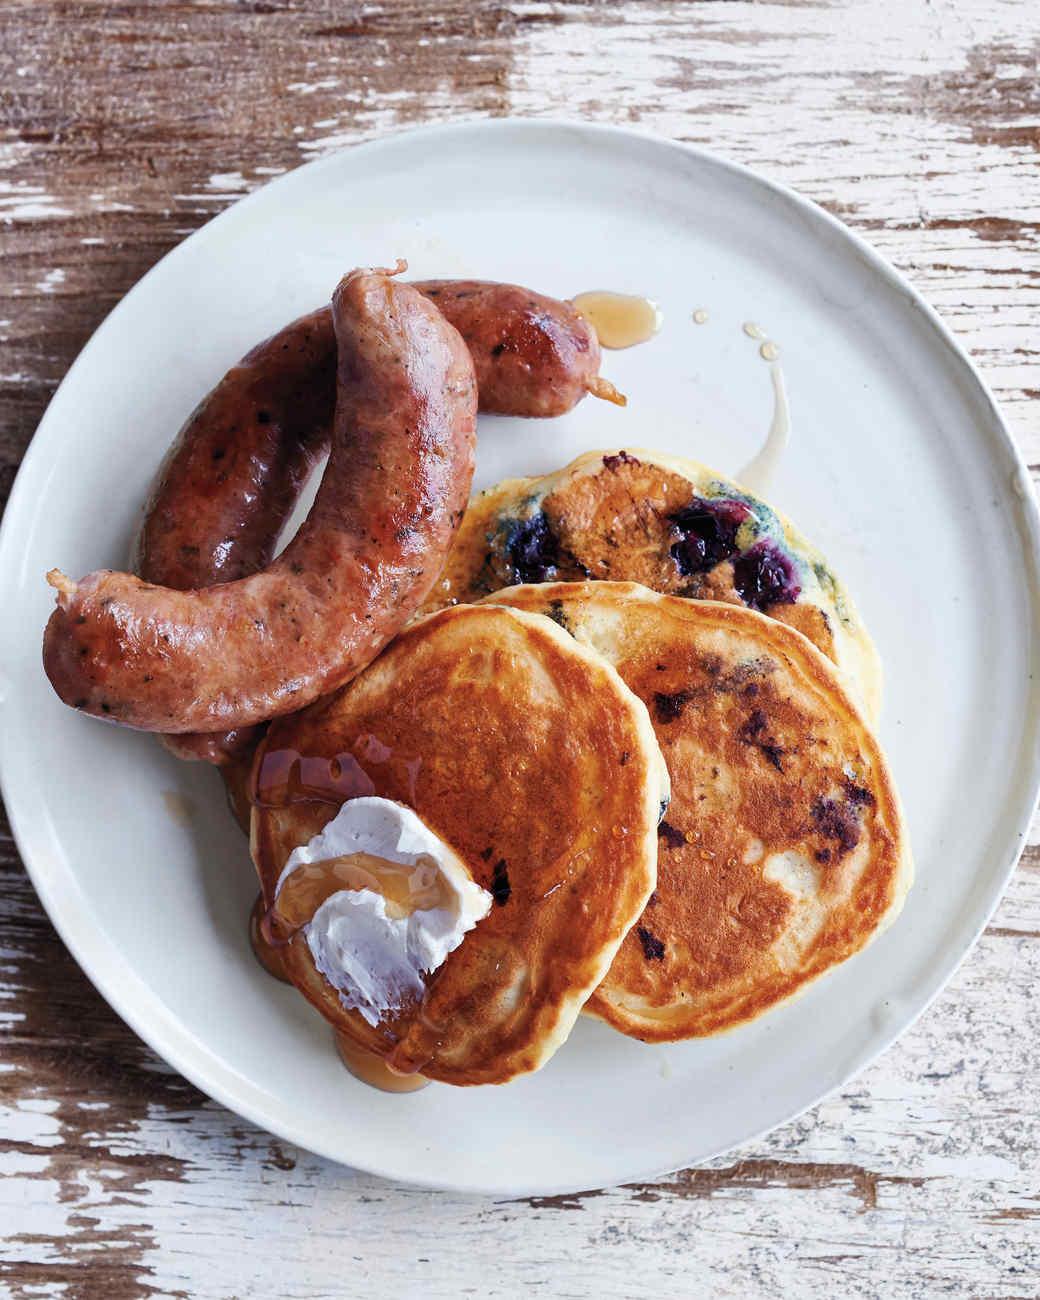 wyebrook-farm-sausage-pancakes-06-016-d111590.jpg